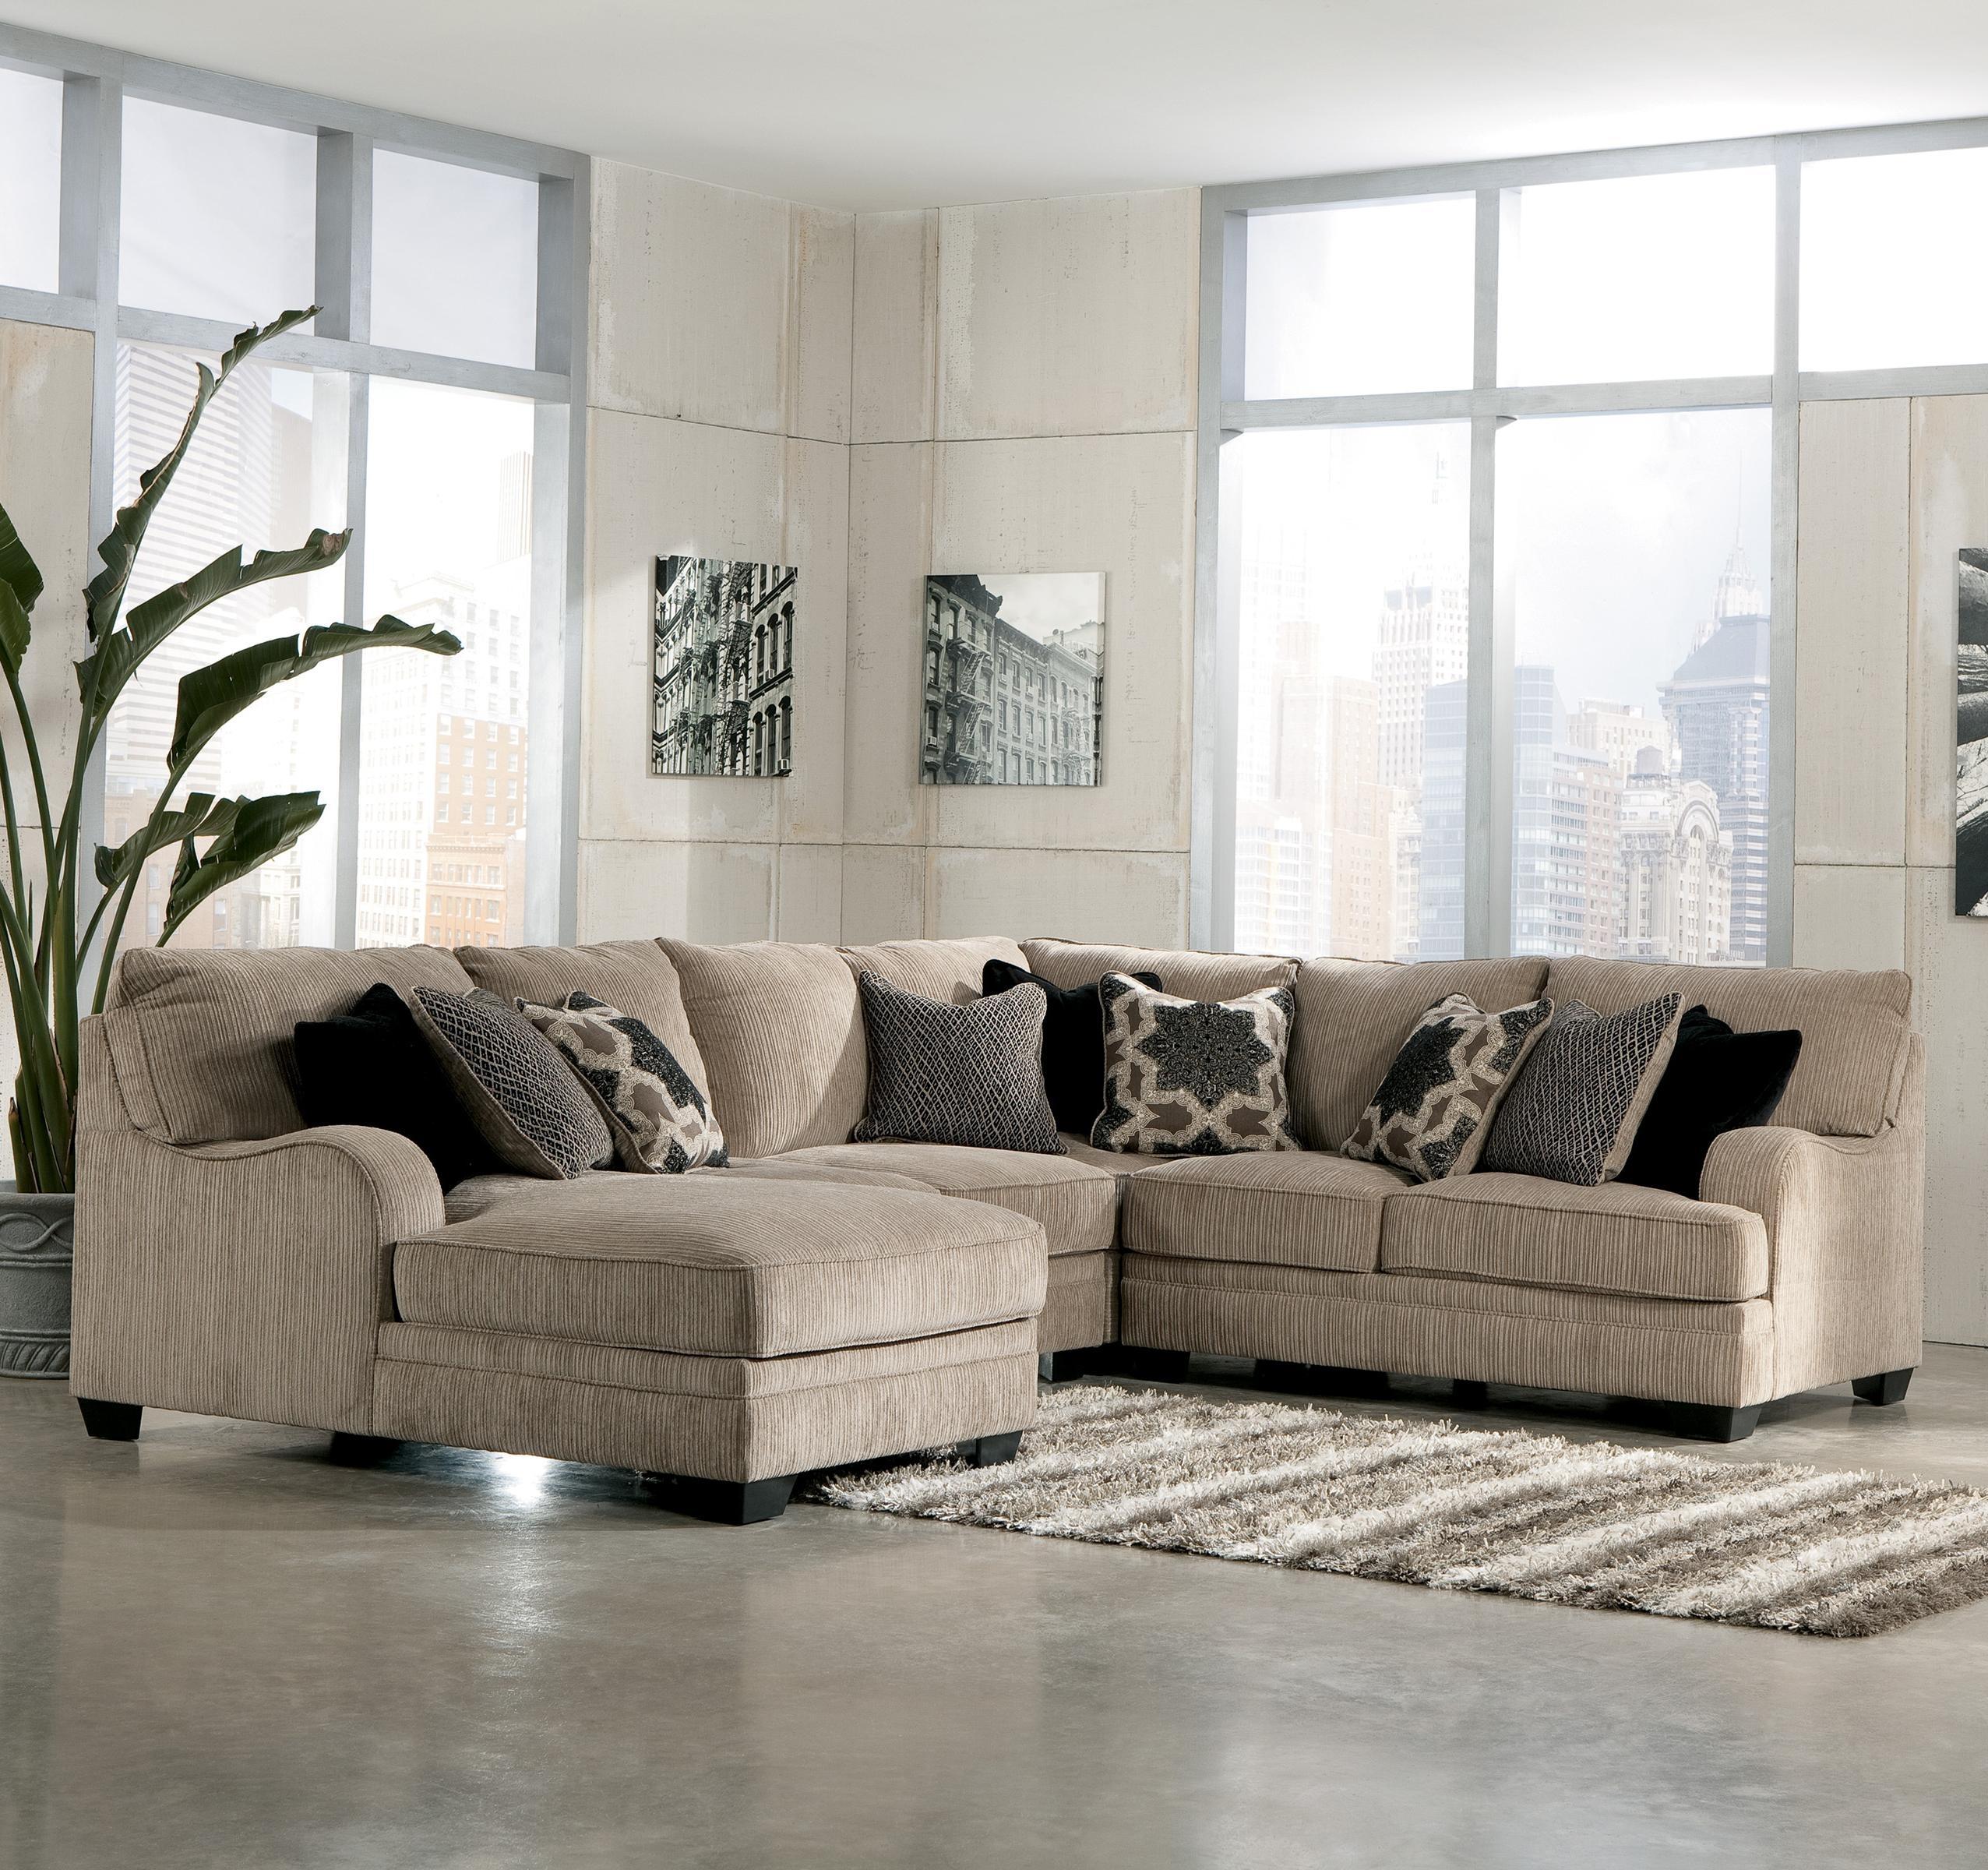 Signature Designashley Katisha – Platinum 4 Piece Sectional Sofa Pertaining To Peterborough Ontario Sectional Sofas (Image 9 of 10)